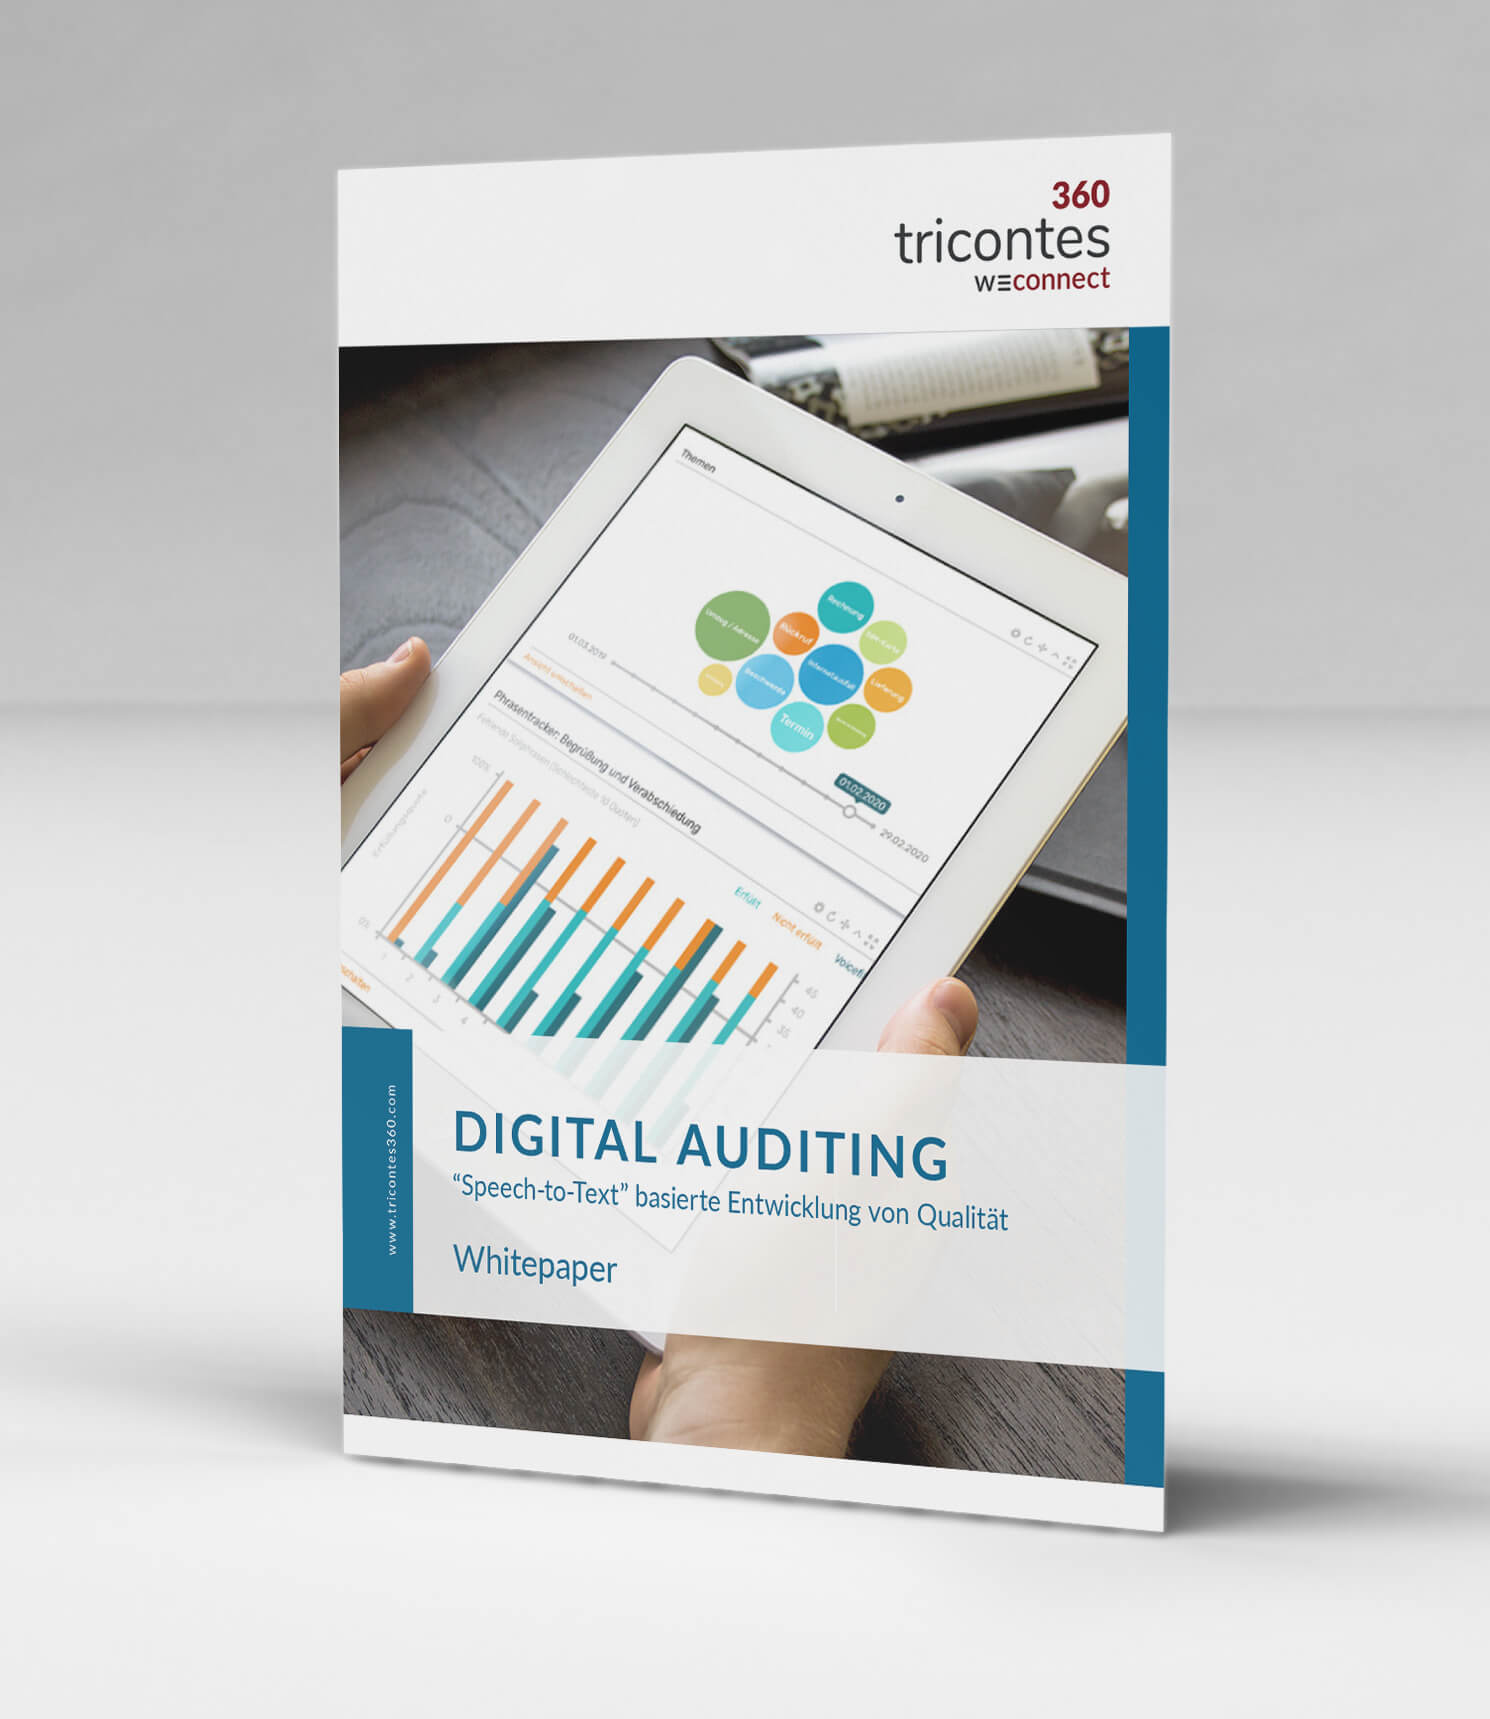 Digital Auditing (DE)